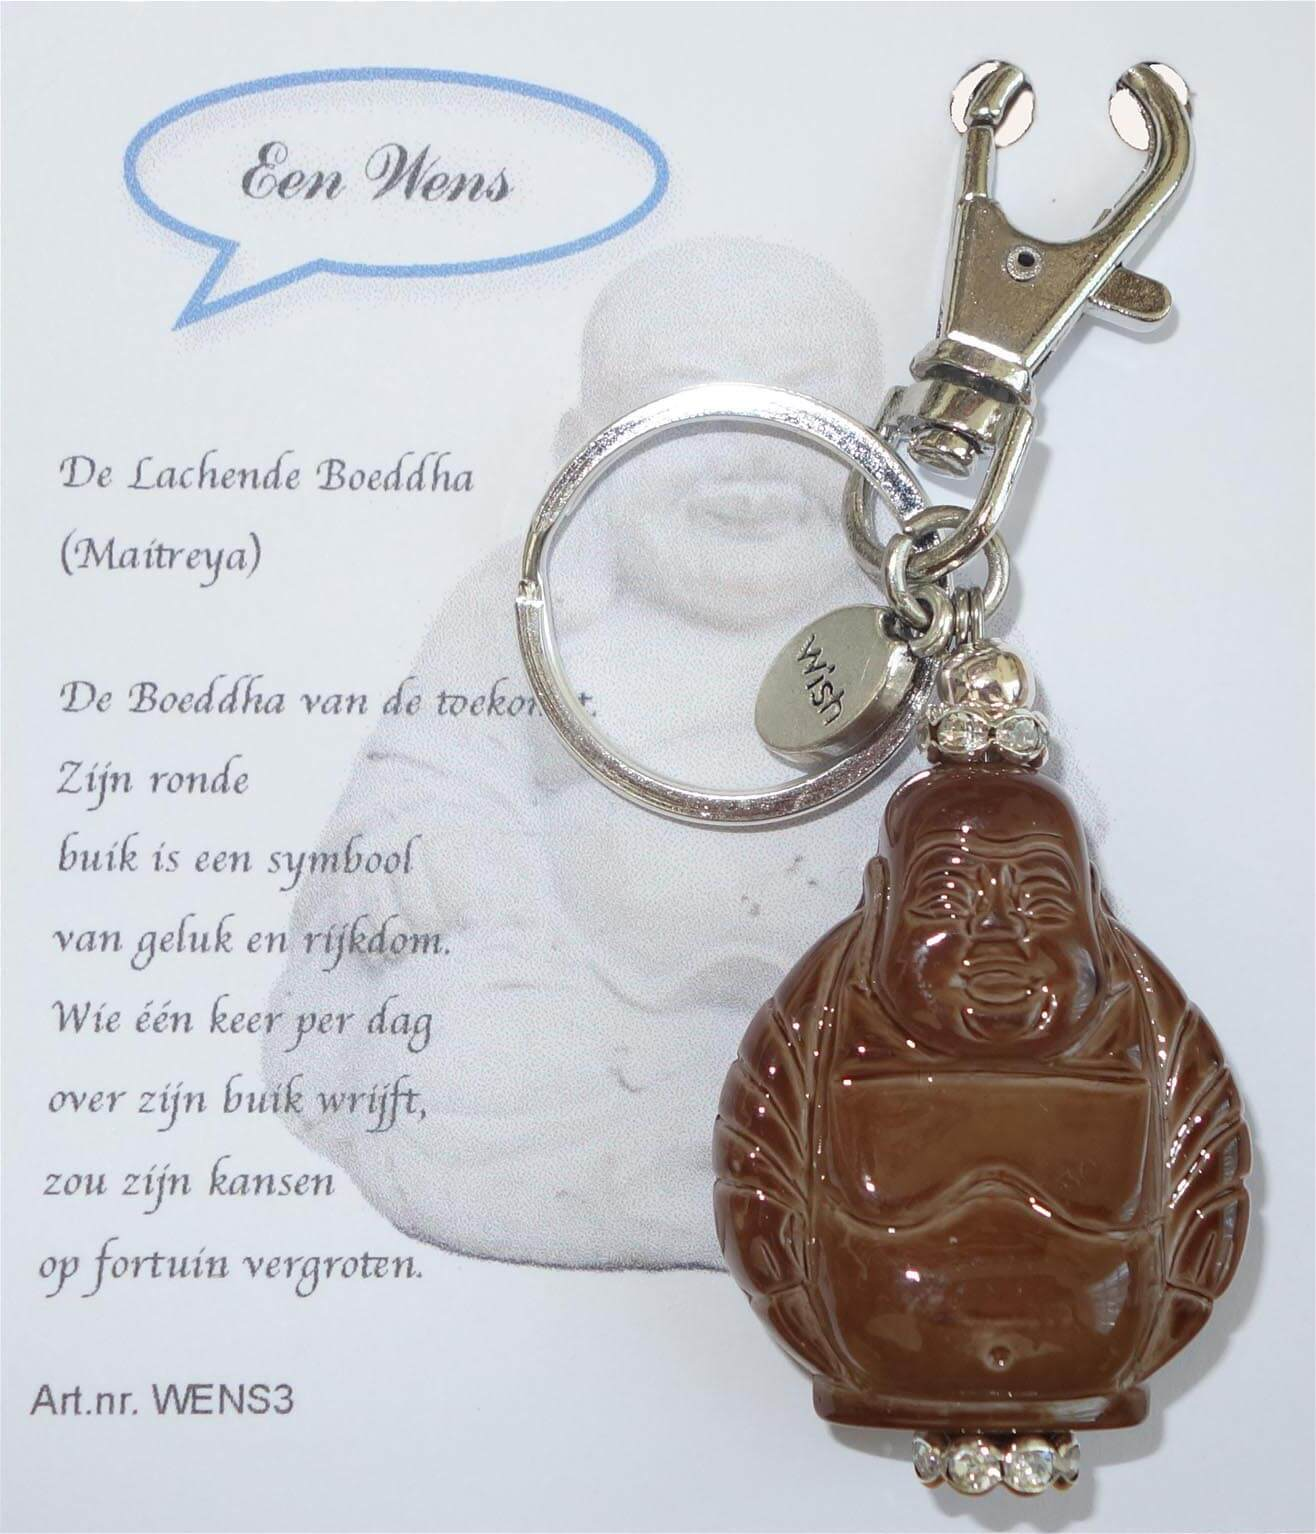 De Lachende Boeddha (Maitreya) Sleutelhanger Bruin-0